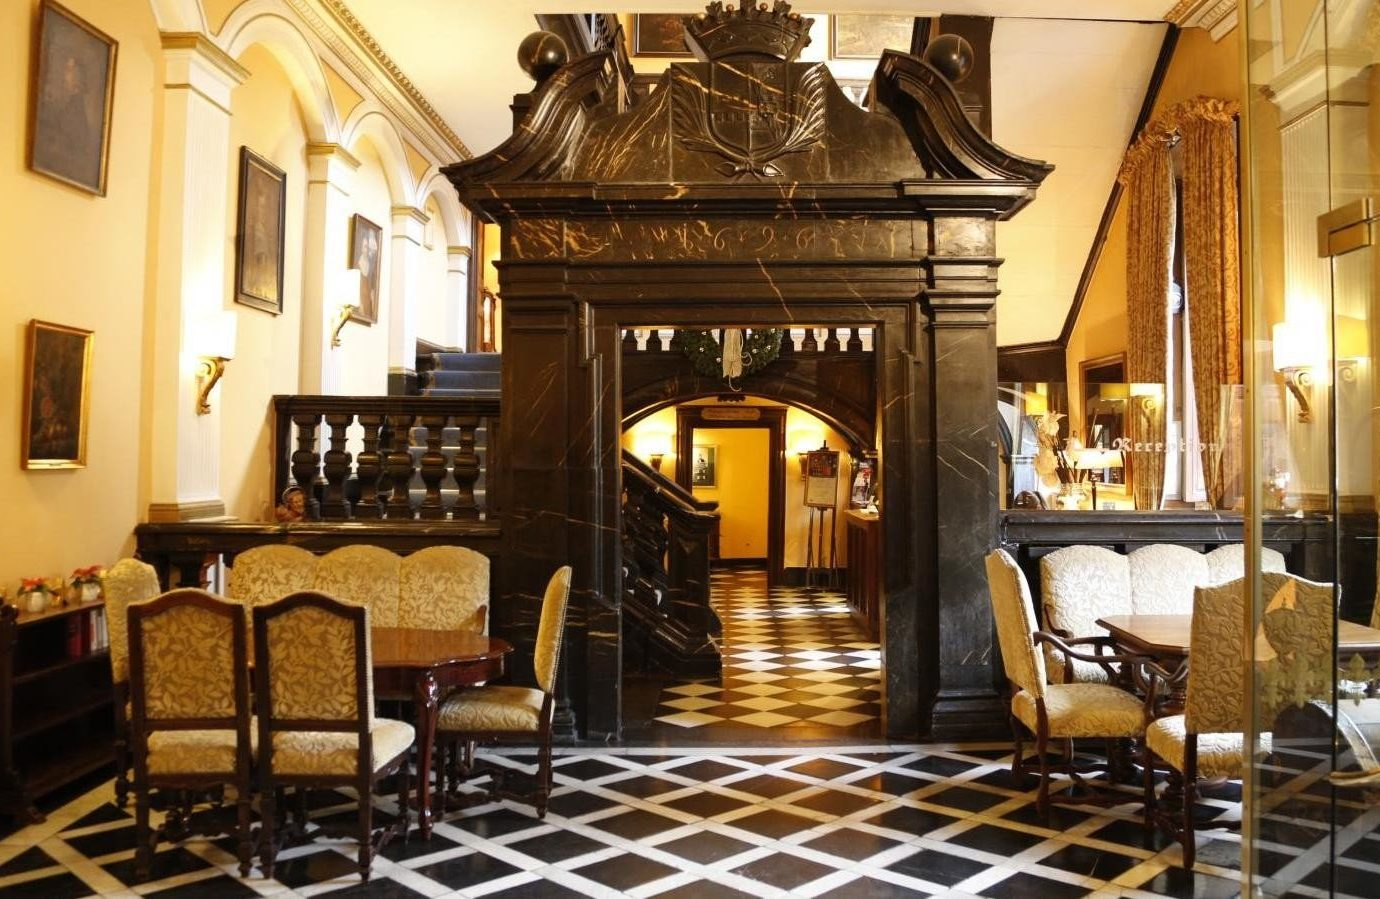 Hotels Landmarks Luxury Travel indoor floor Living room chair property interior design Lobby furniture living room Dining estate decorated